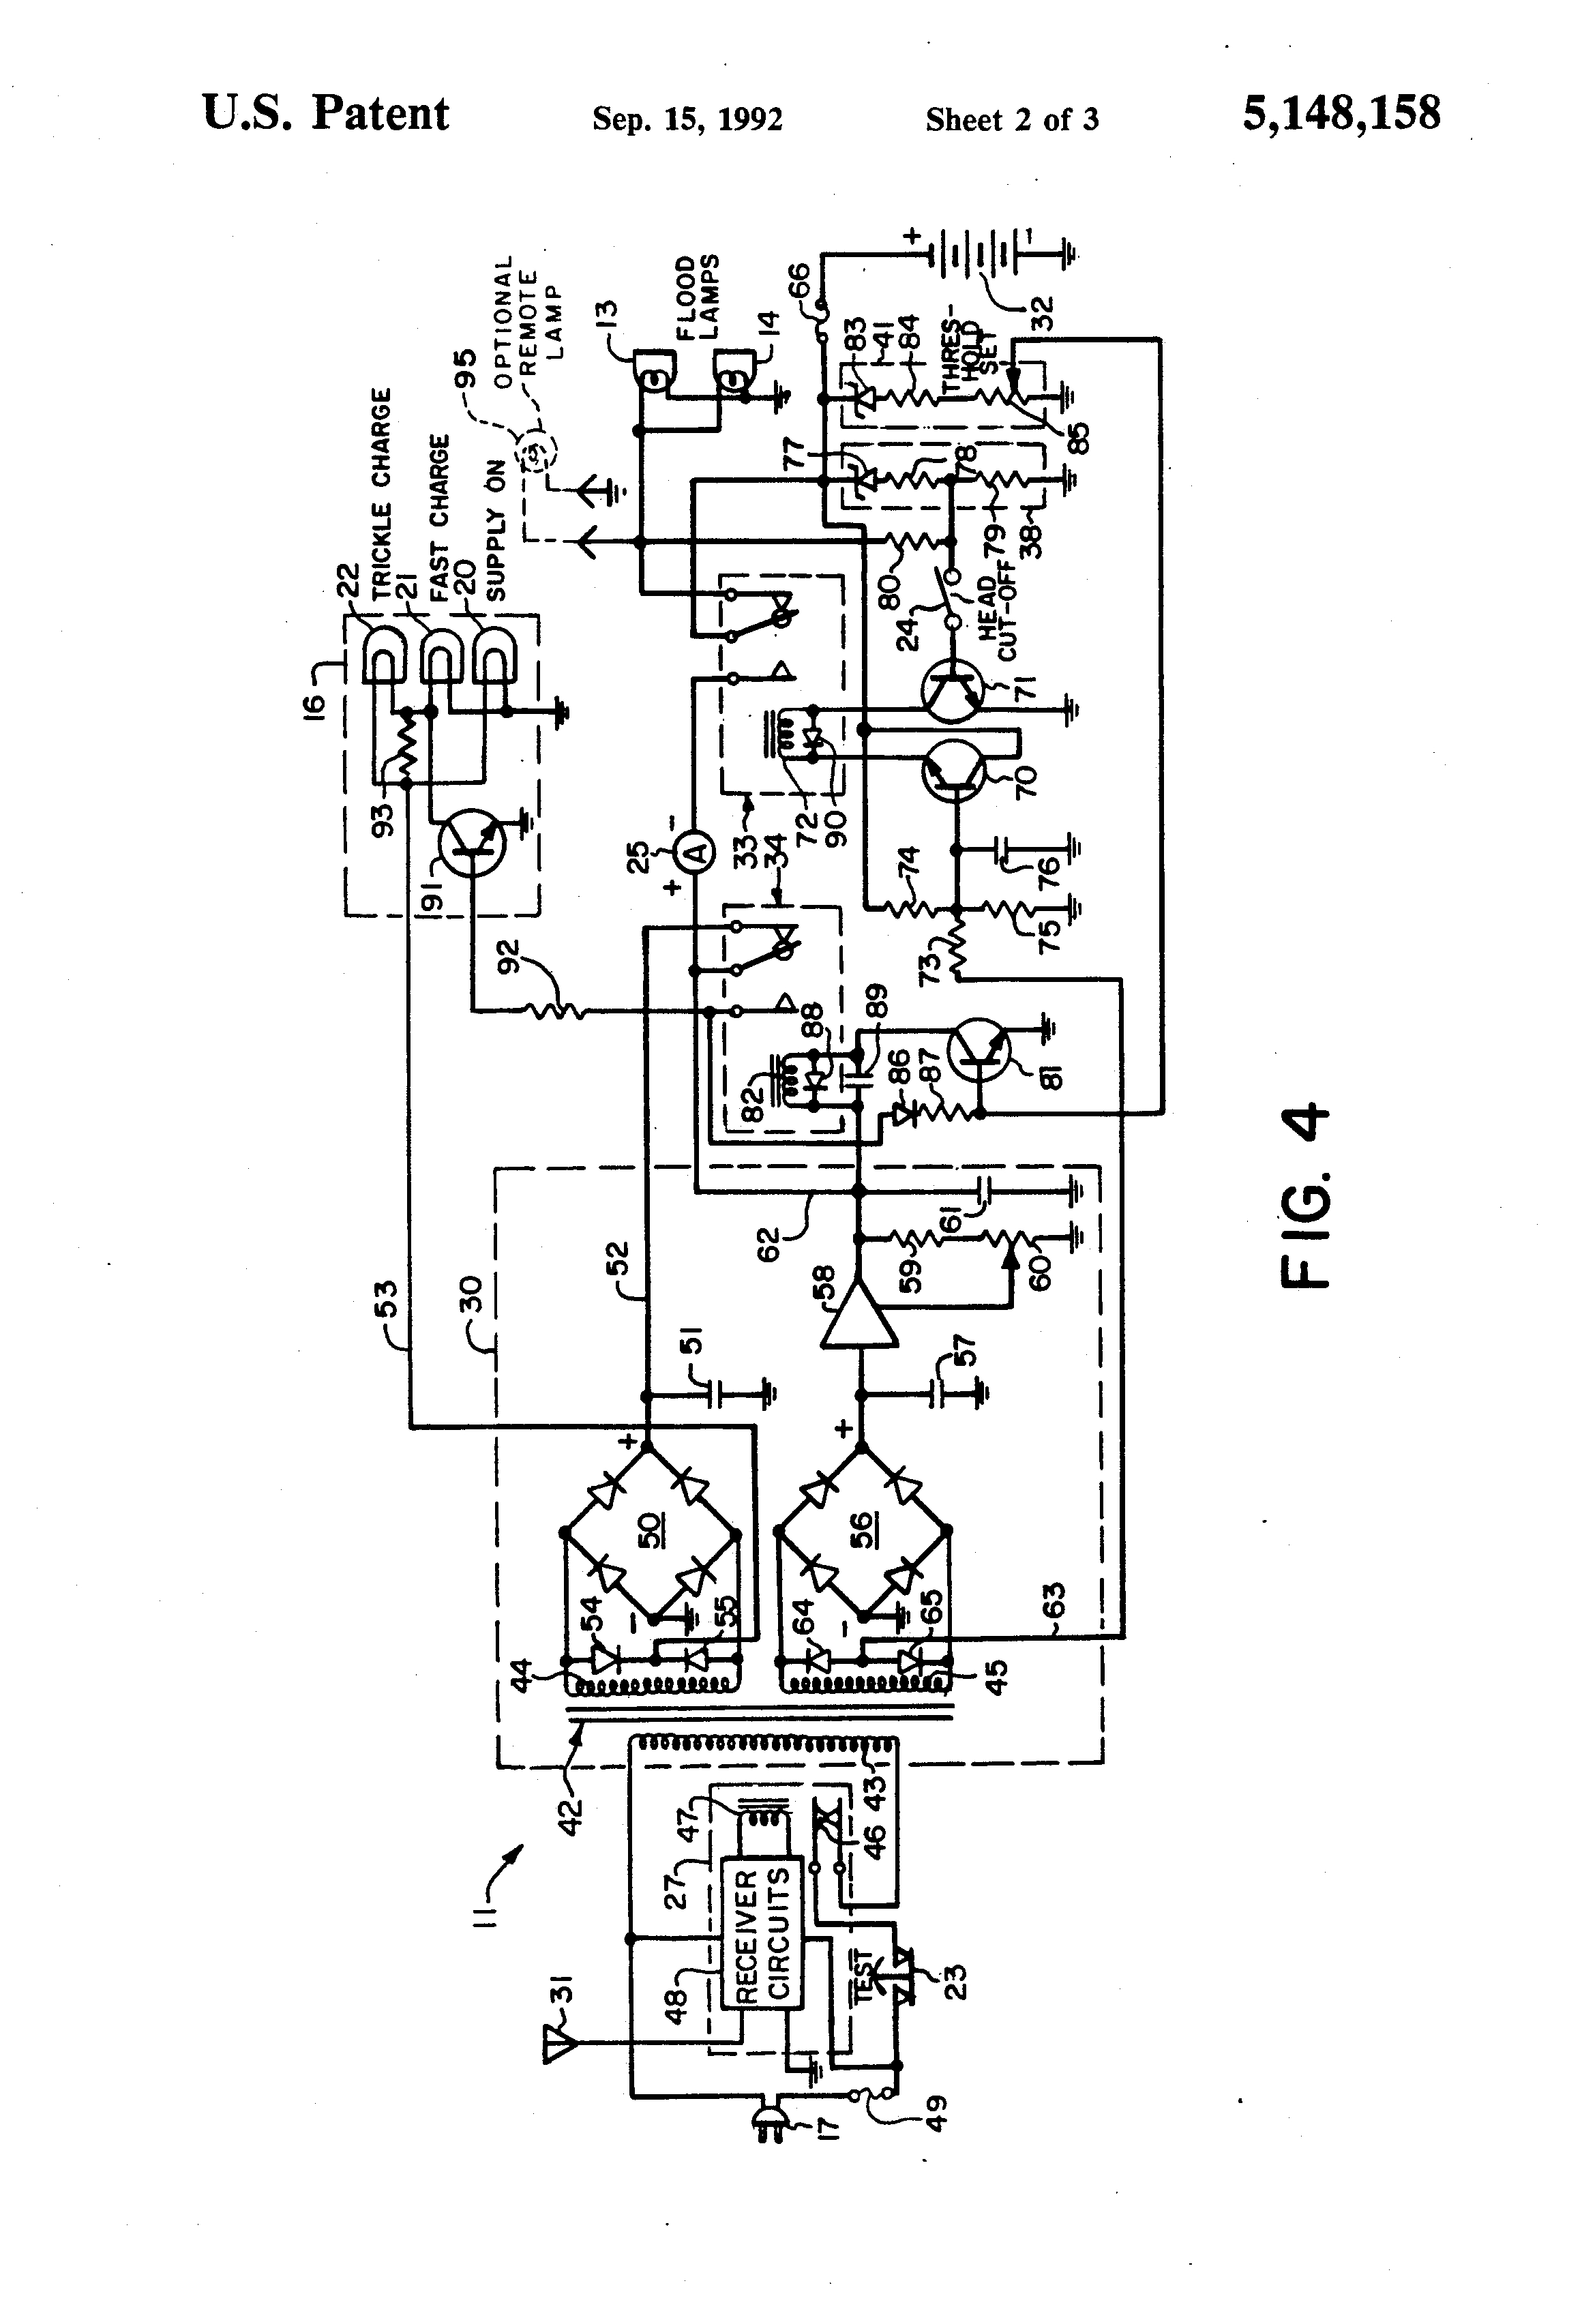 iota i 24 emergency ballast wiring diagram troy bilt tiller carburetor download